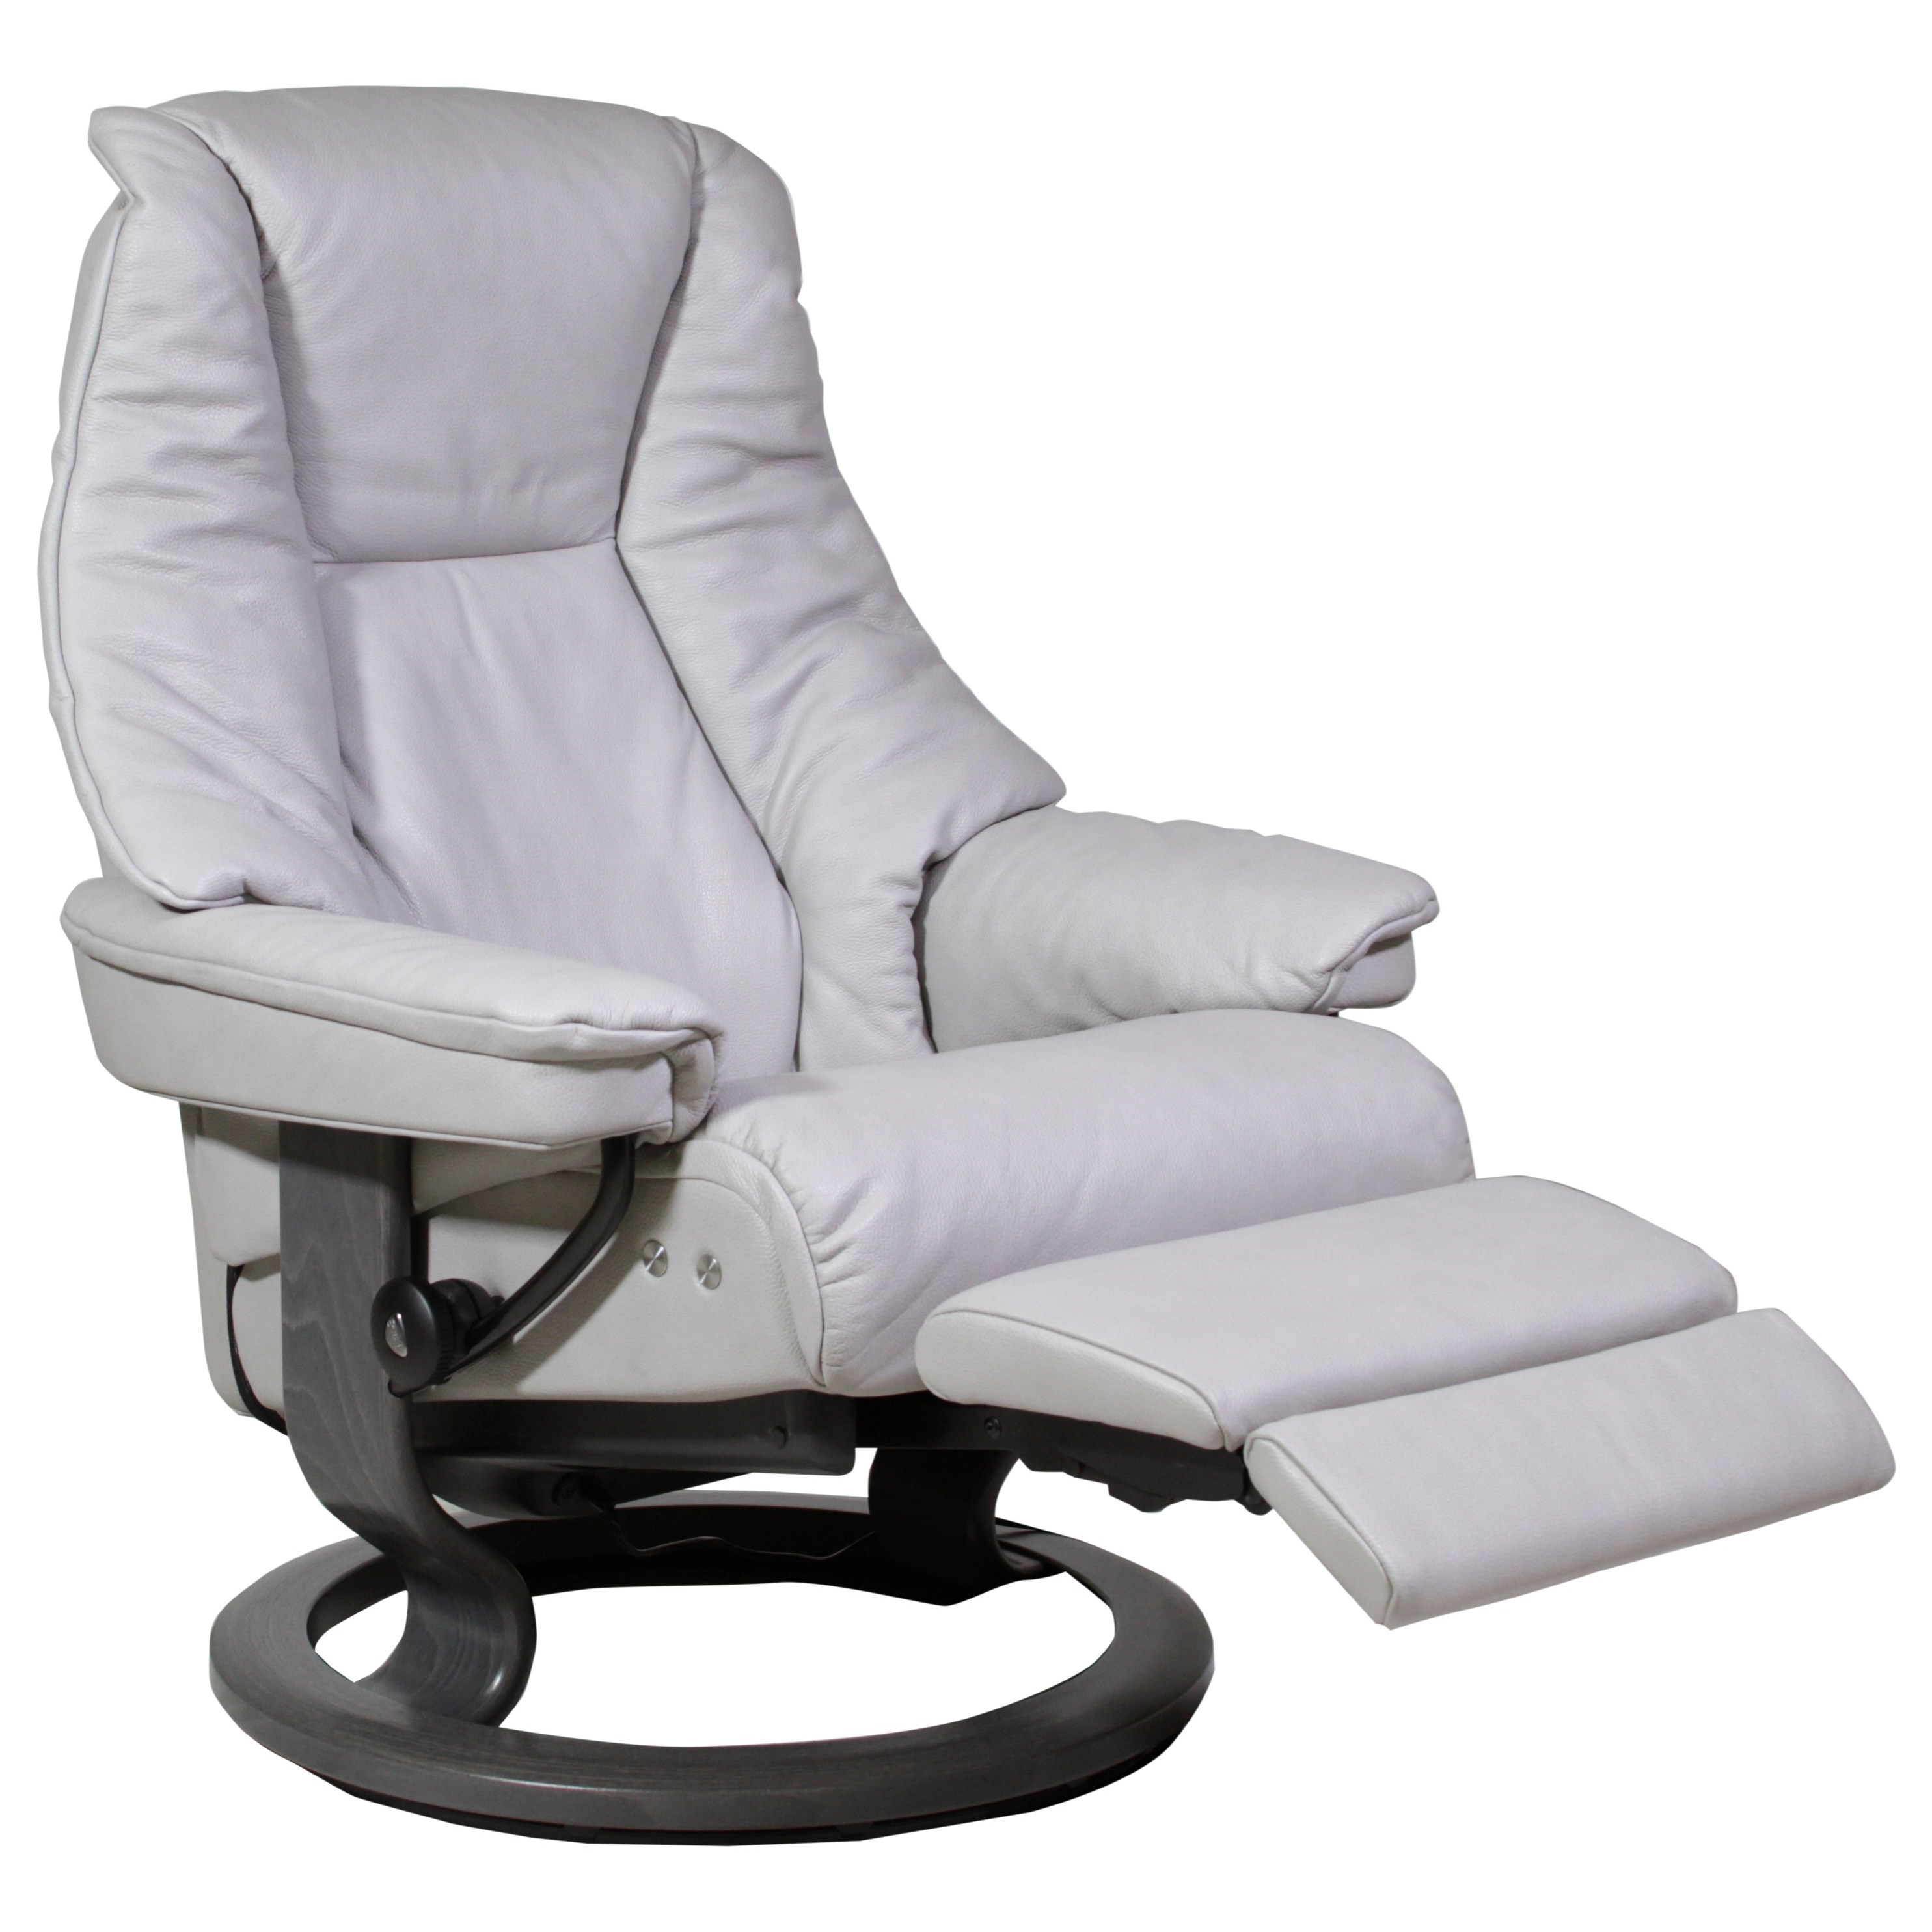 Stressless by Ekornes Live  Medium LegComfort™ Chair - Item Number: 13197150912508